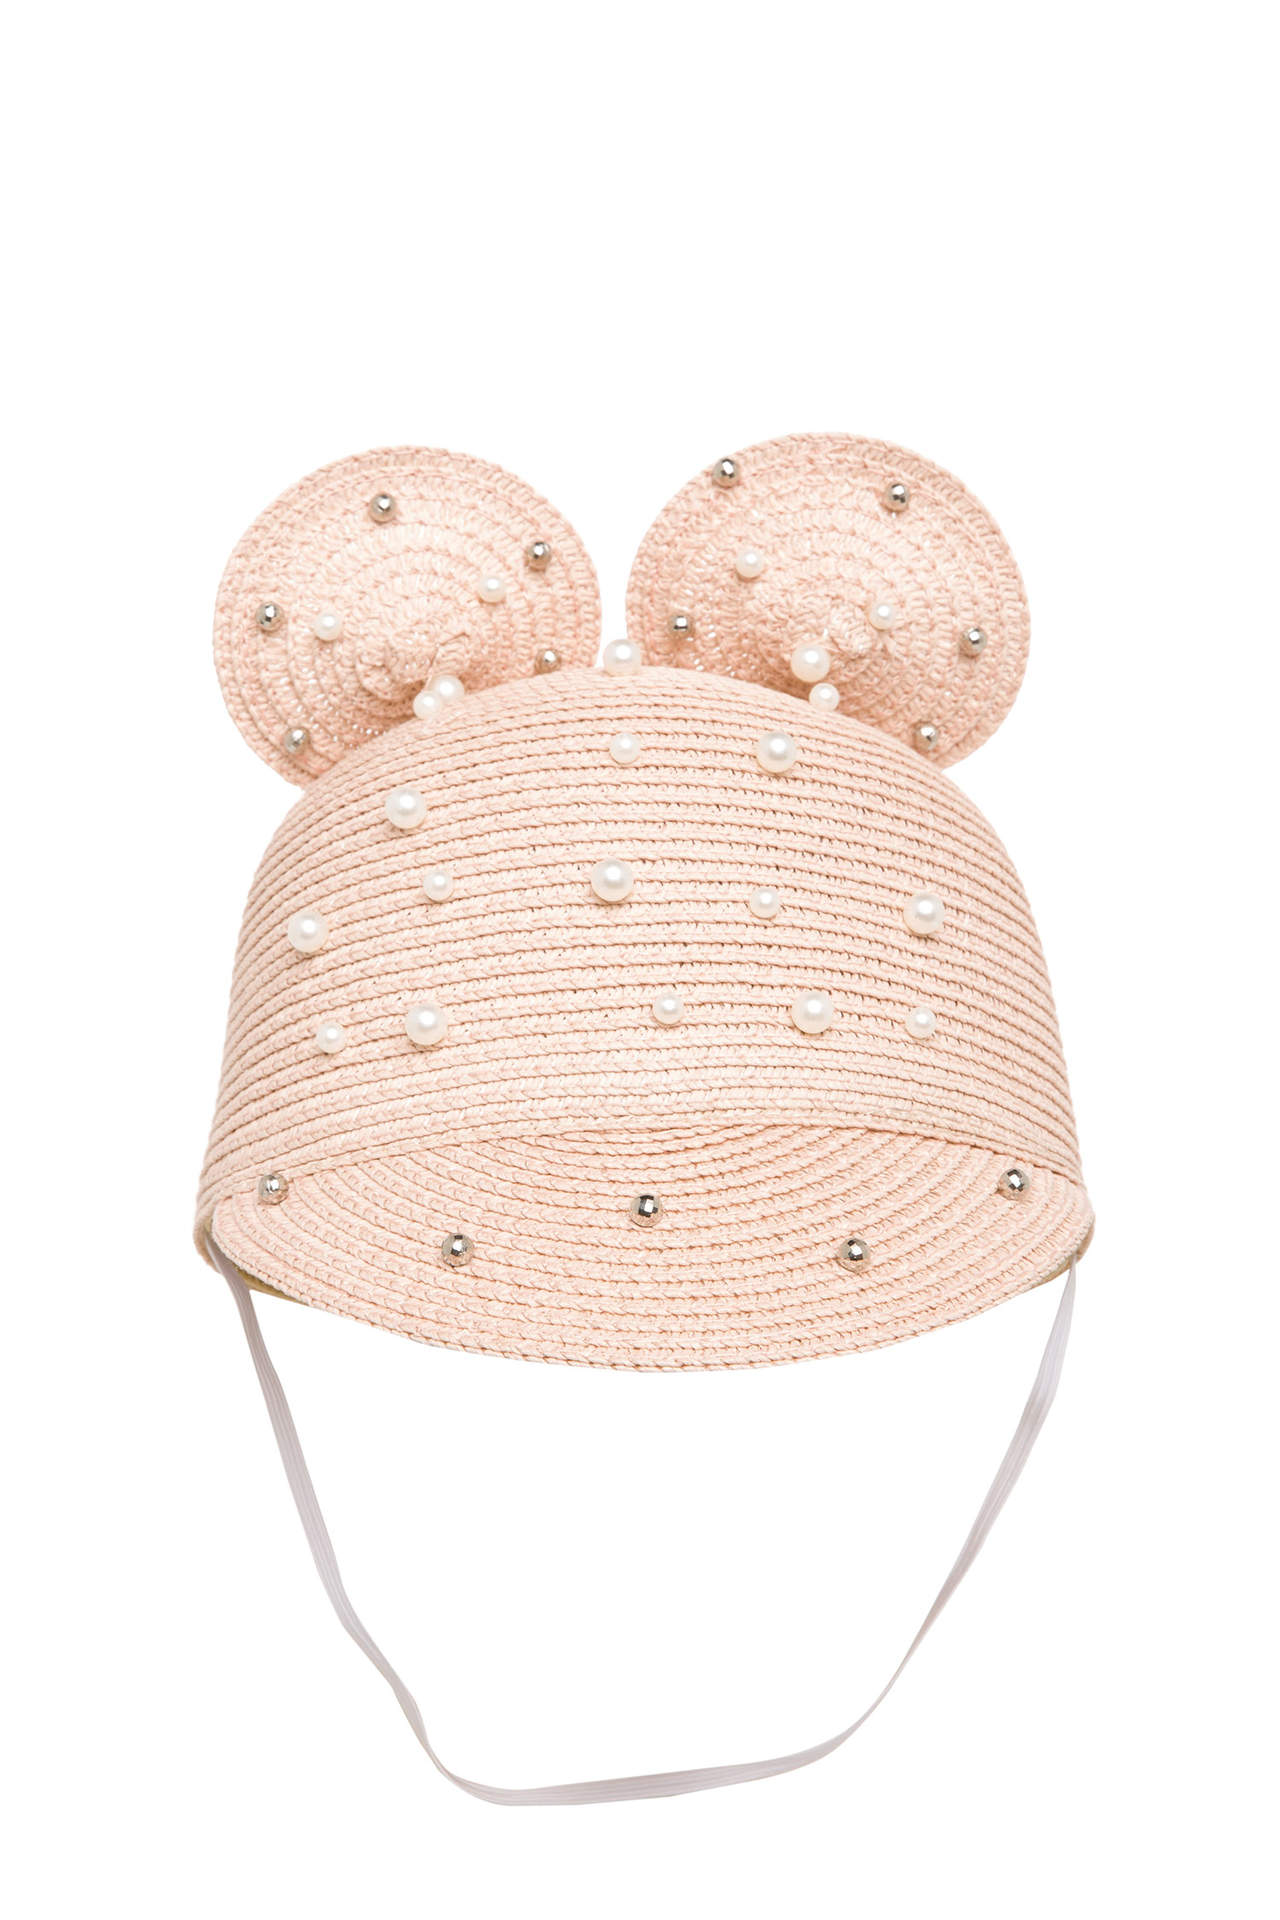 DeFacto Kız Çocuk İnci Detaylı Şapka Pembe female